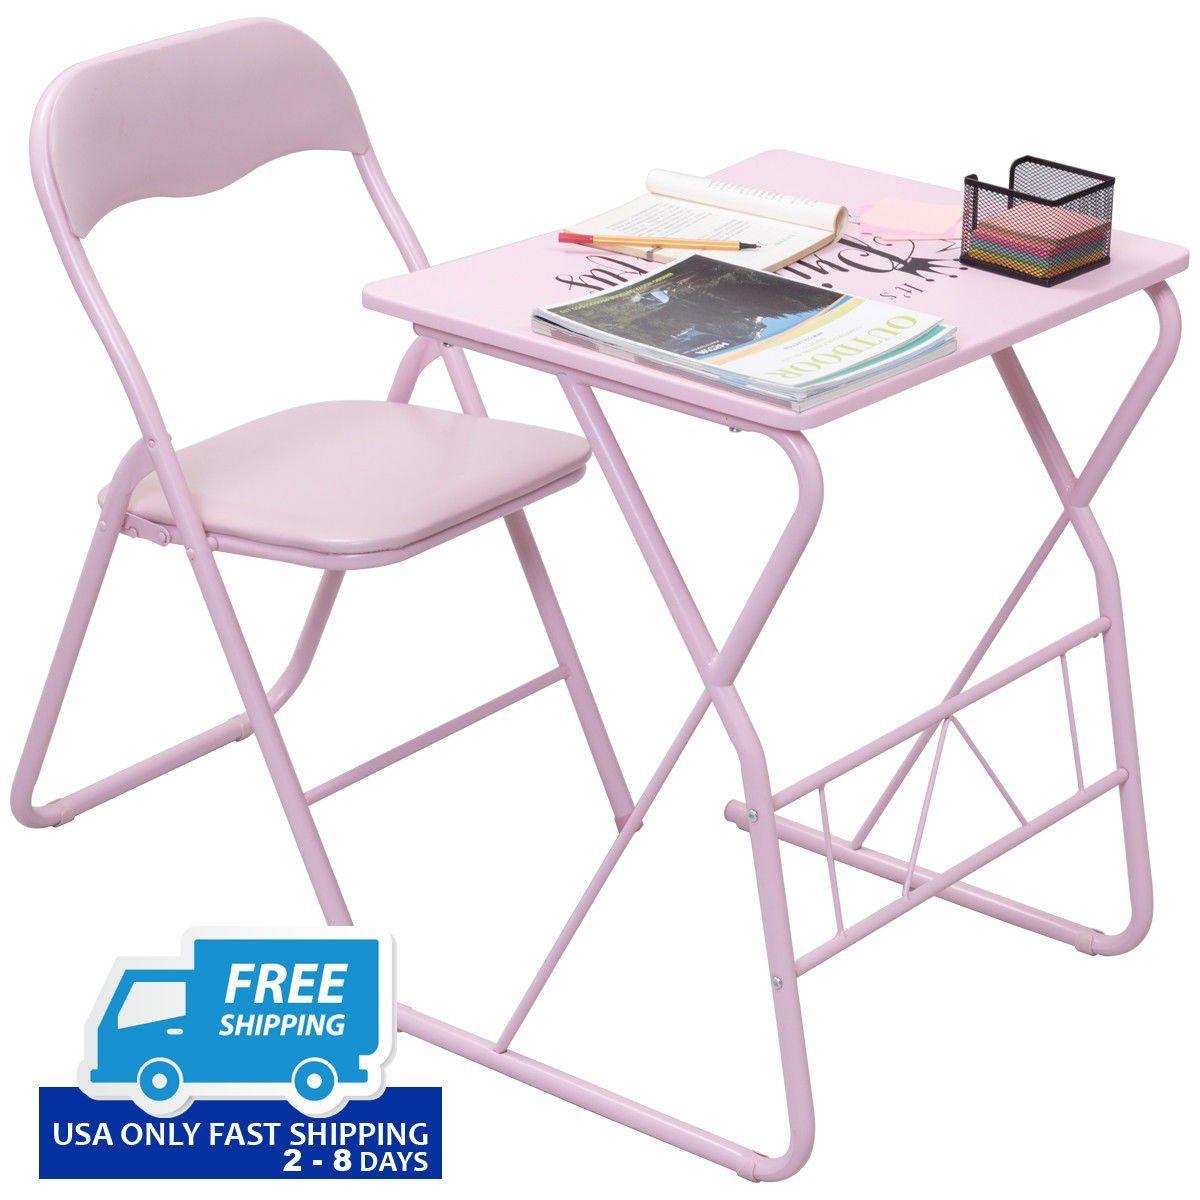 Student Folding Study Writing Chair Table Set!